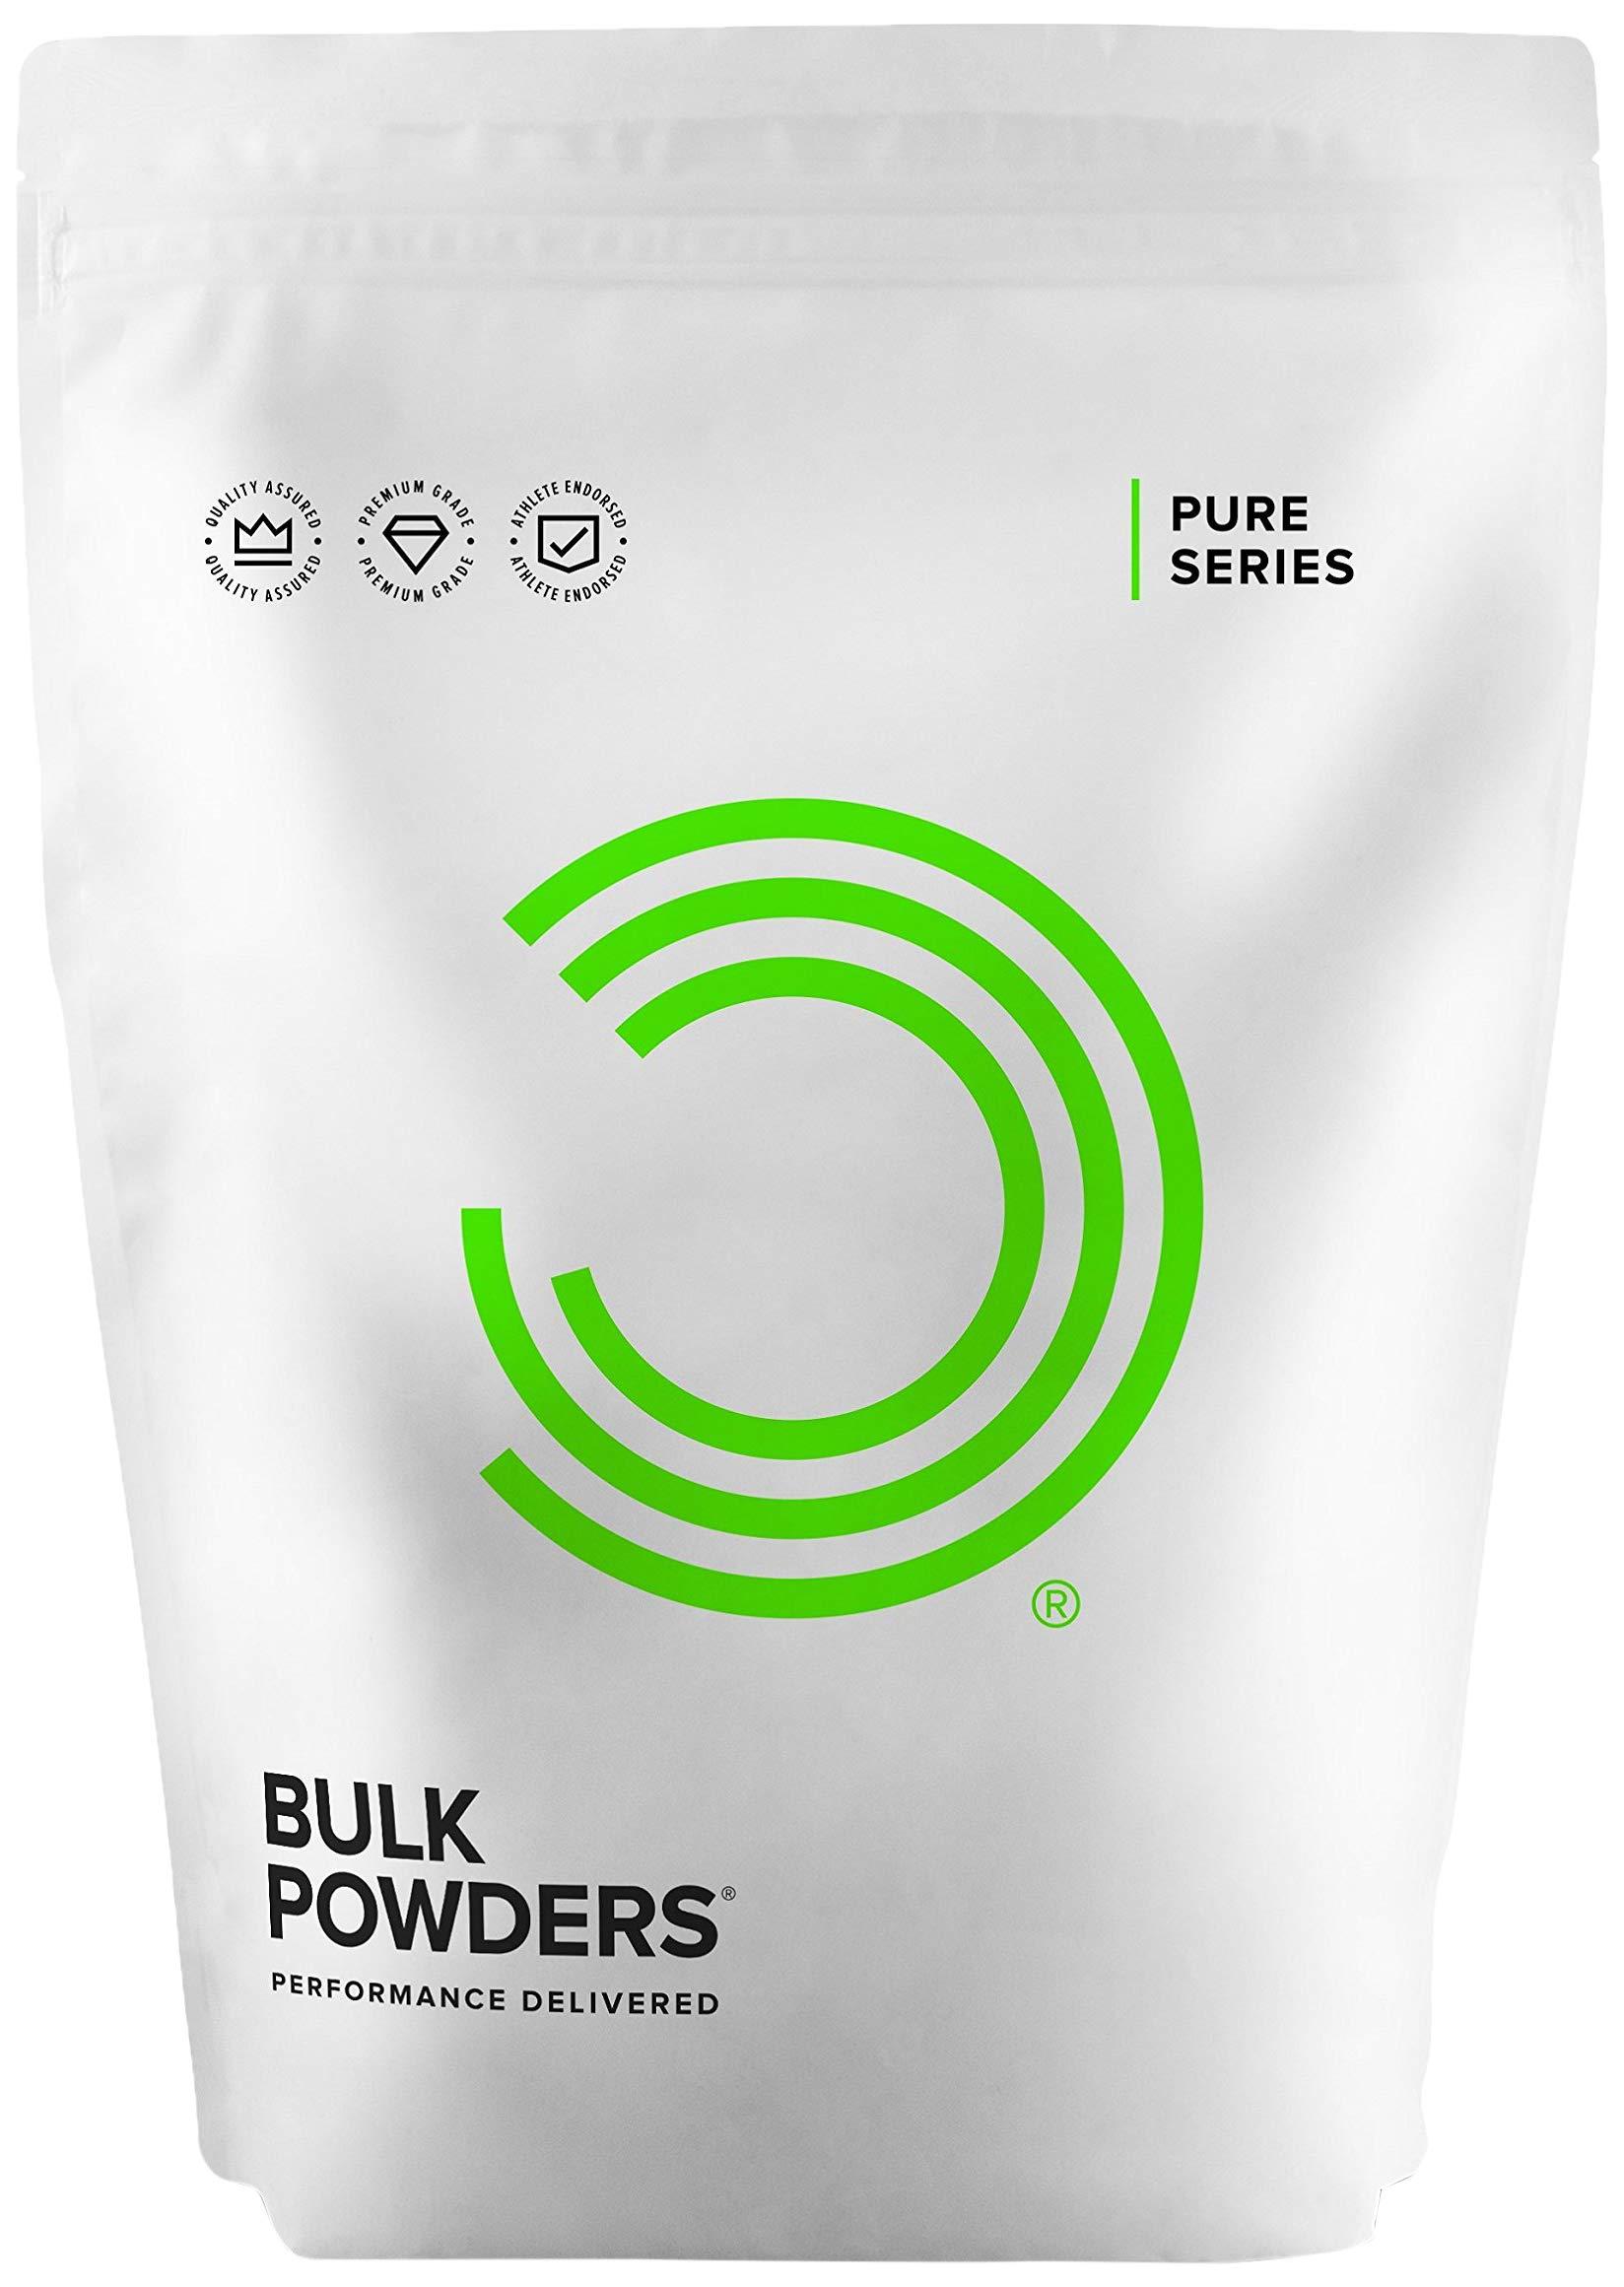 Bulk HMB Powder, 100 g, Packaging May Vary